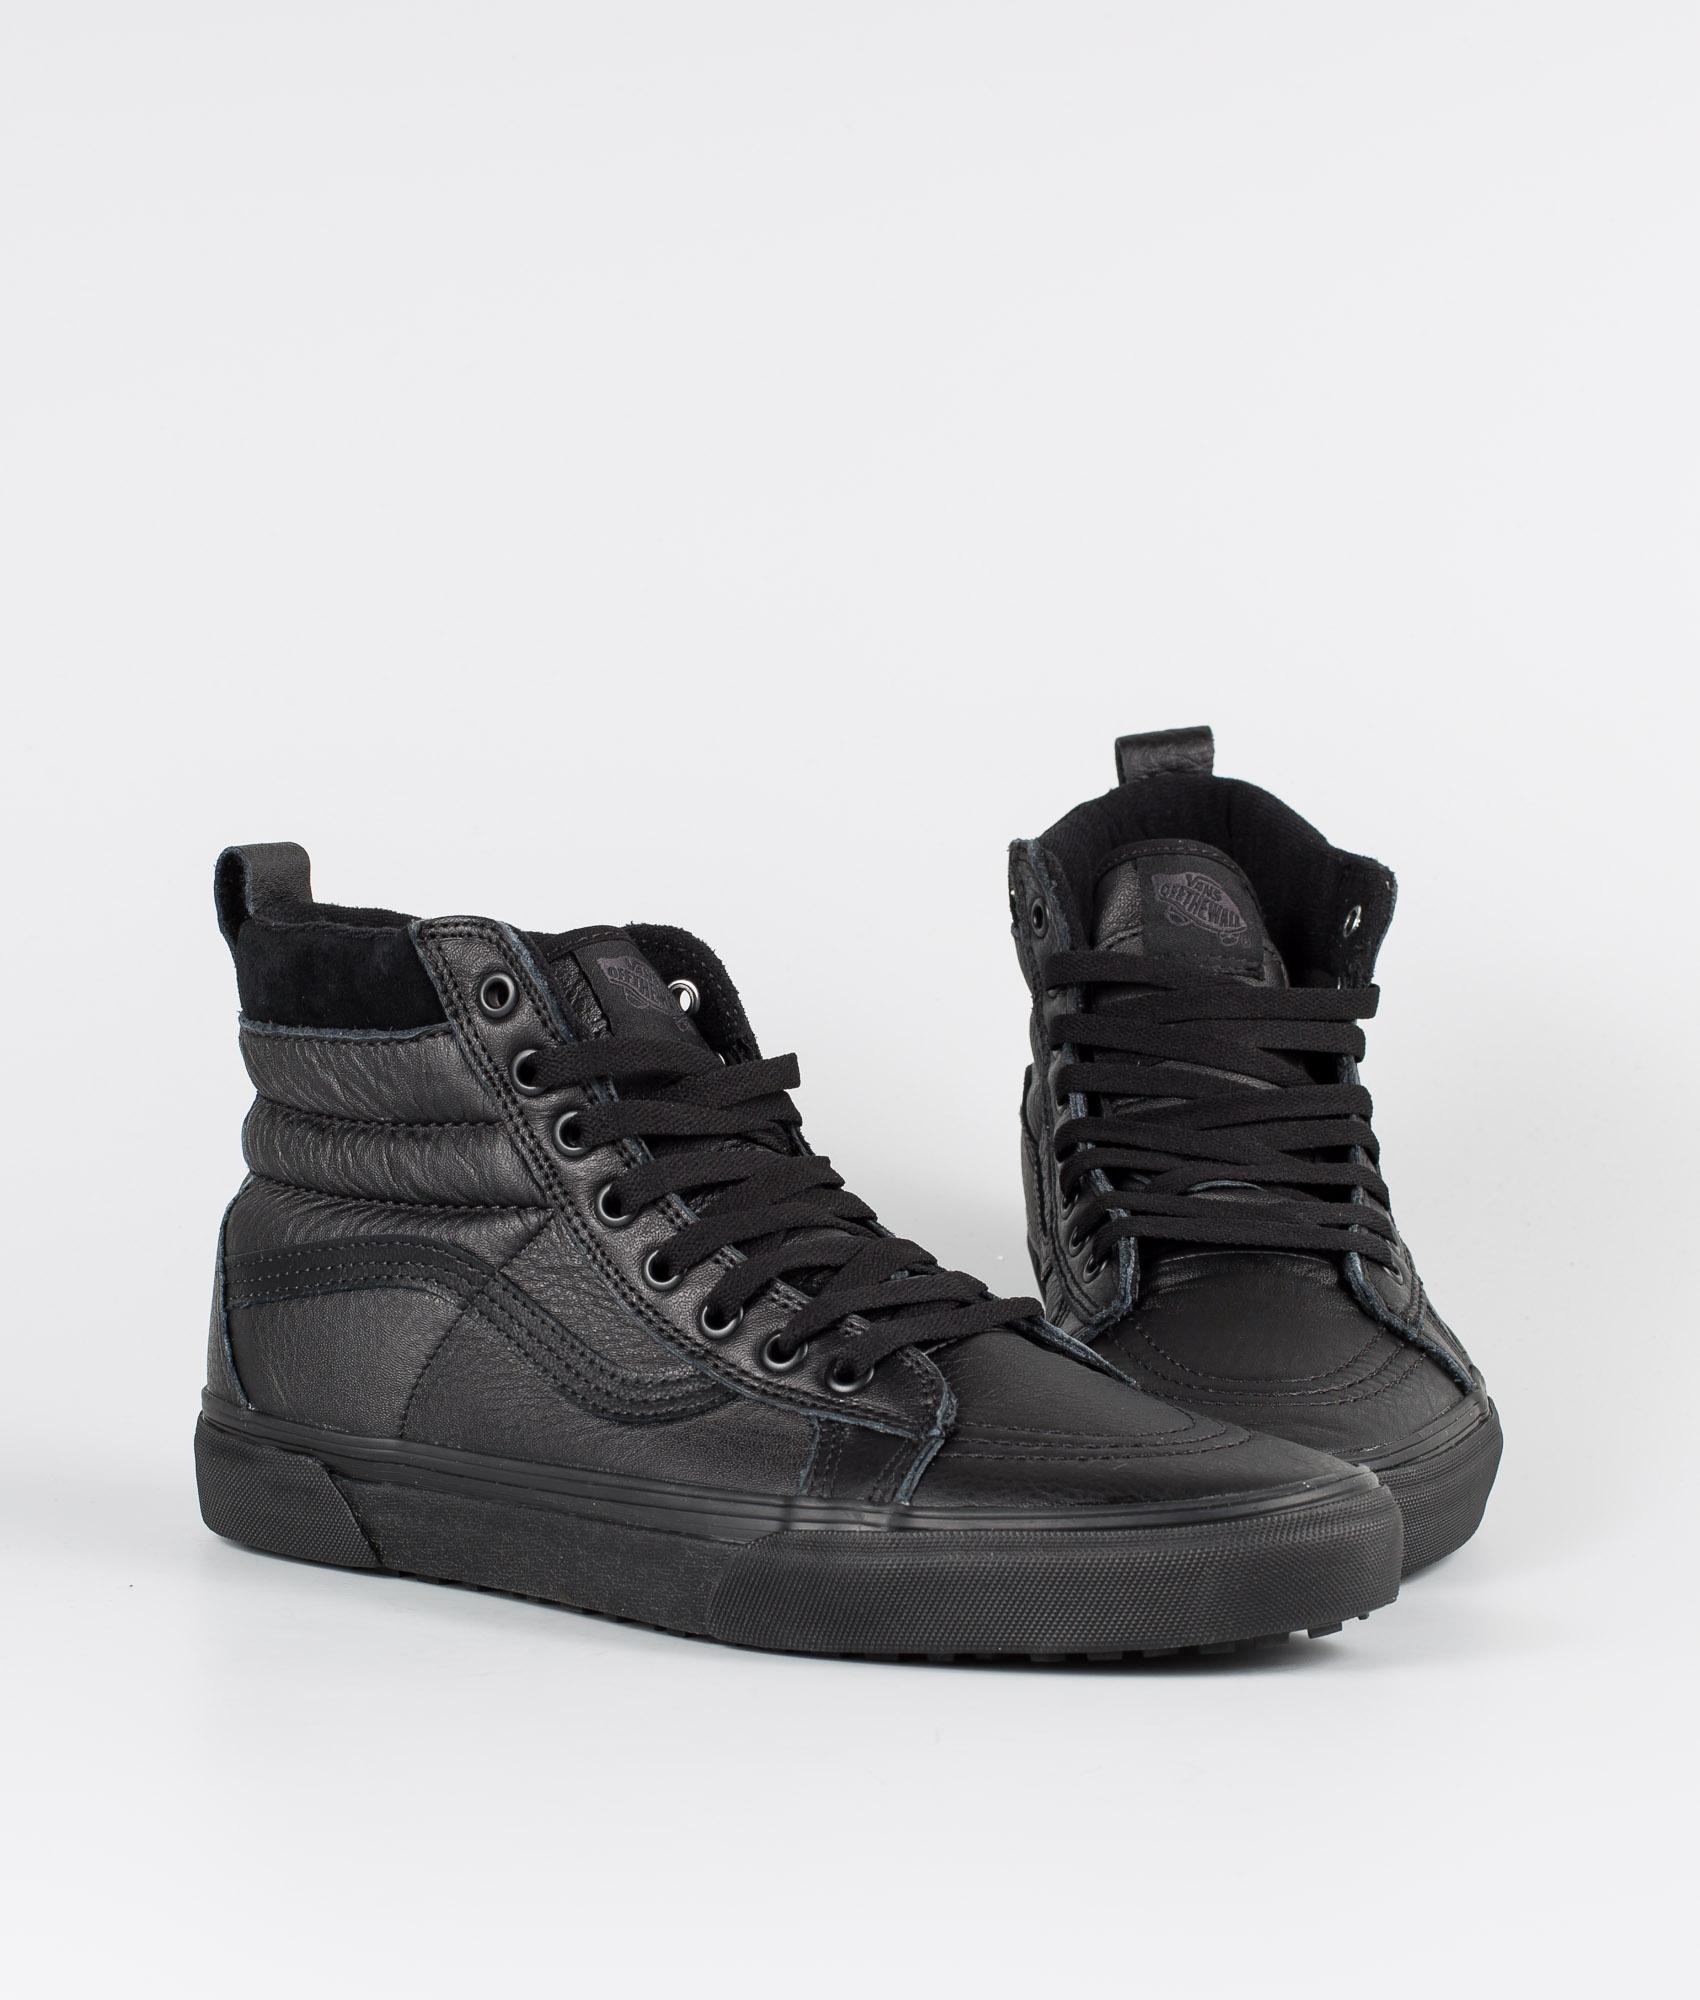 Vans Sk8 Hi MTE Skor (MTE) LeatherBlack